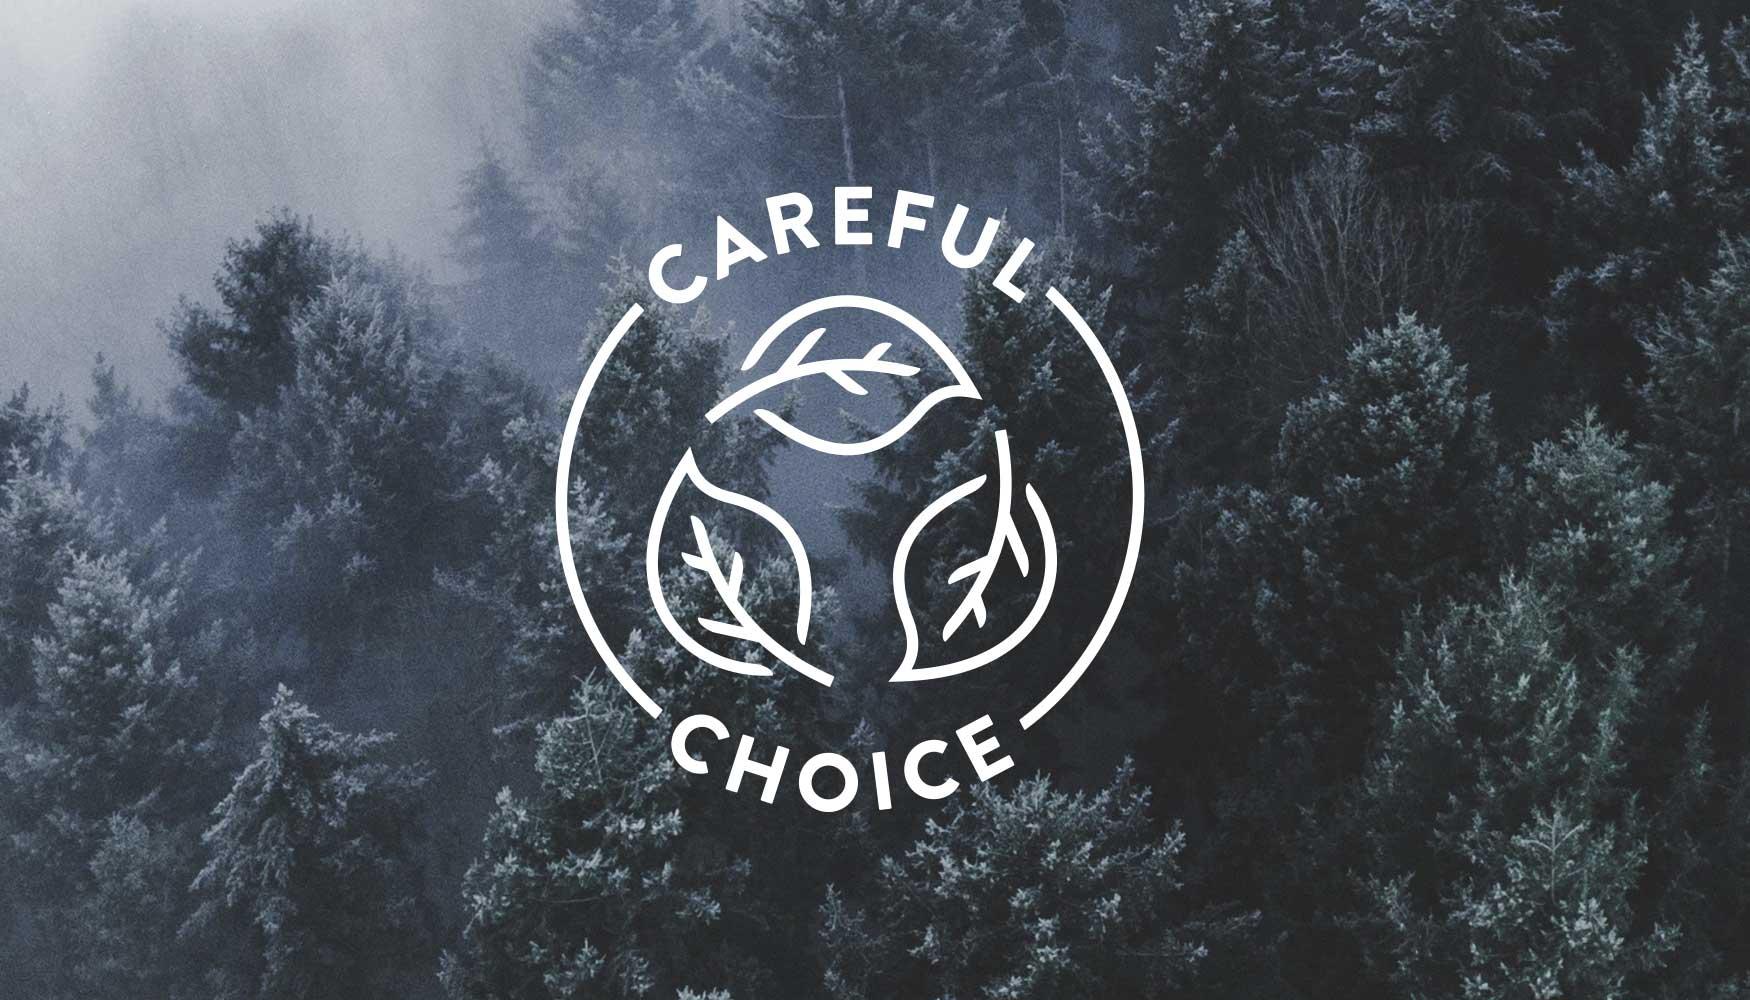 careful_choise_logo1